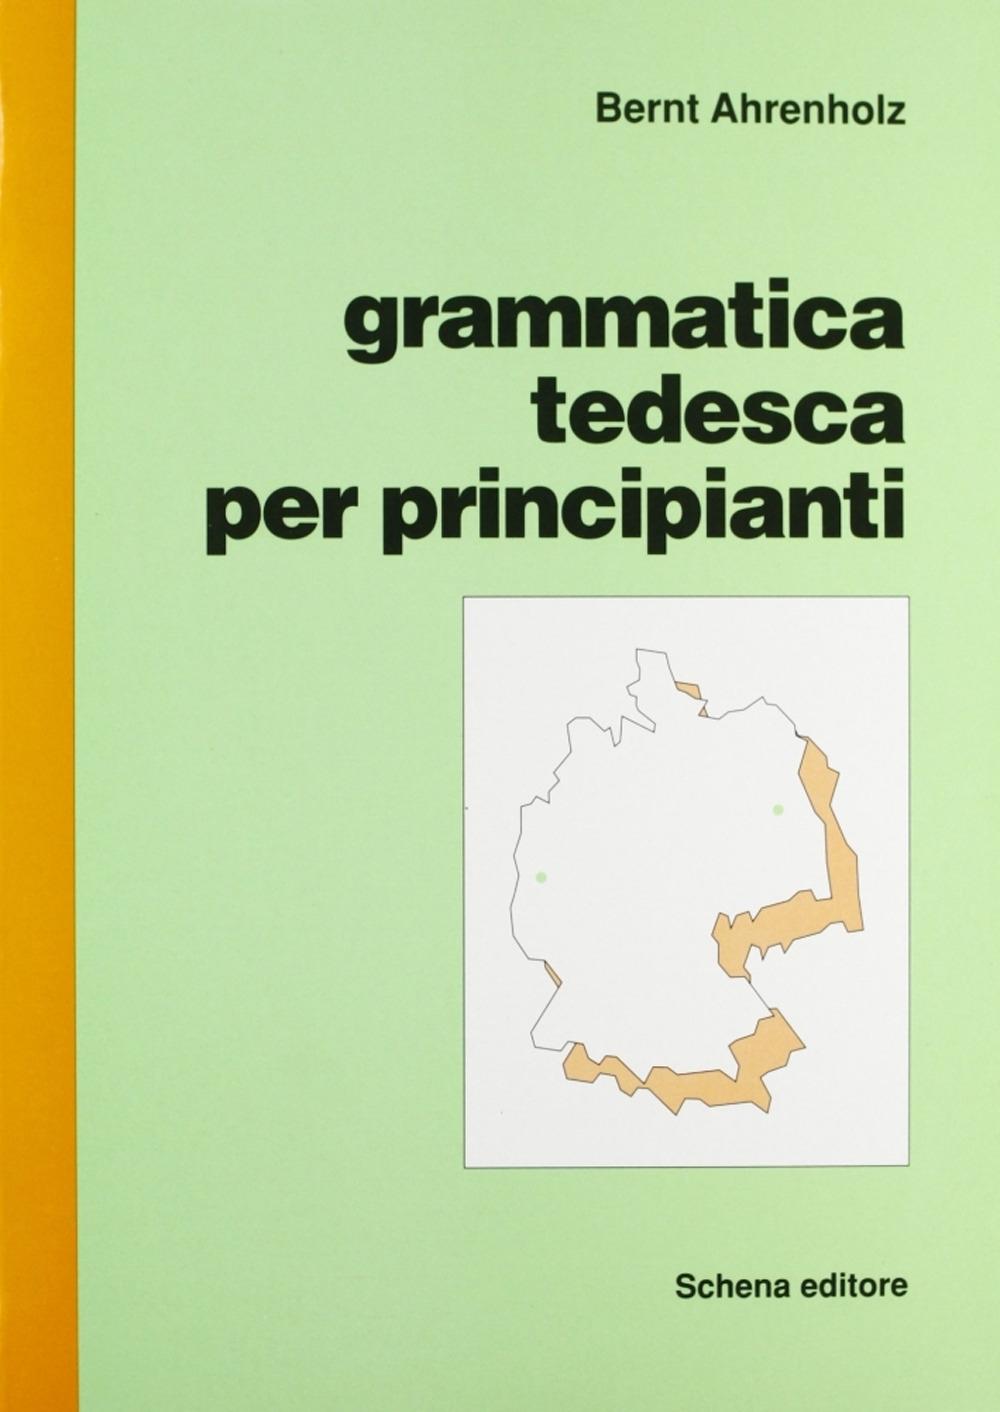 Grammatica tedesca per principianti